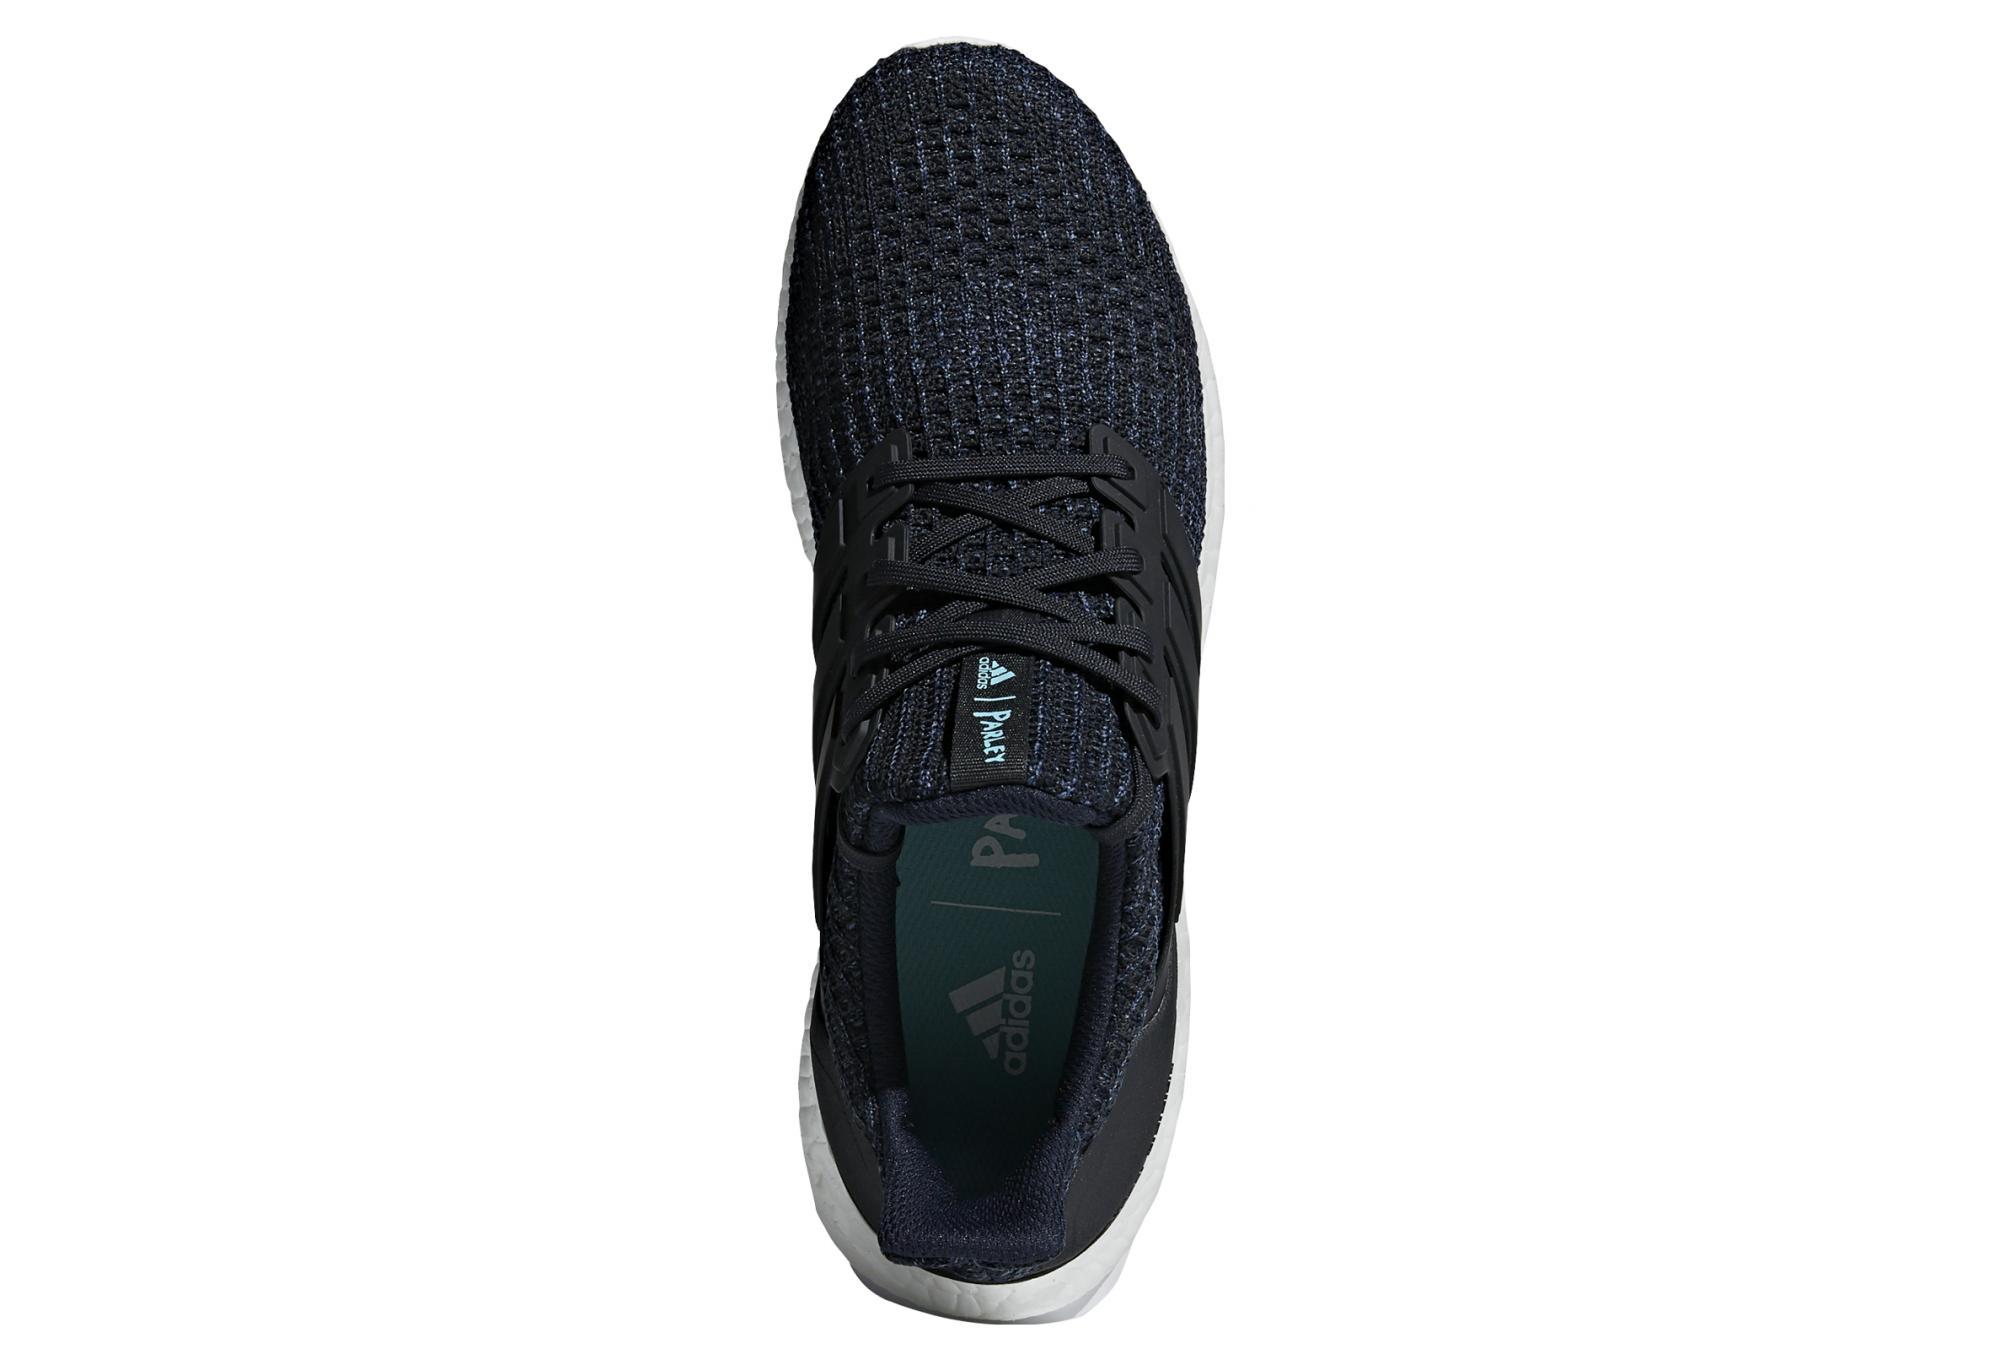 3287468aceb adidas running Ultraboost Parley Black